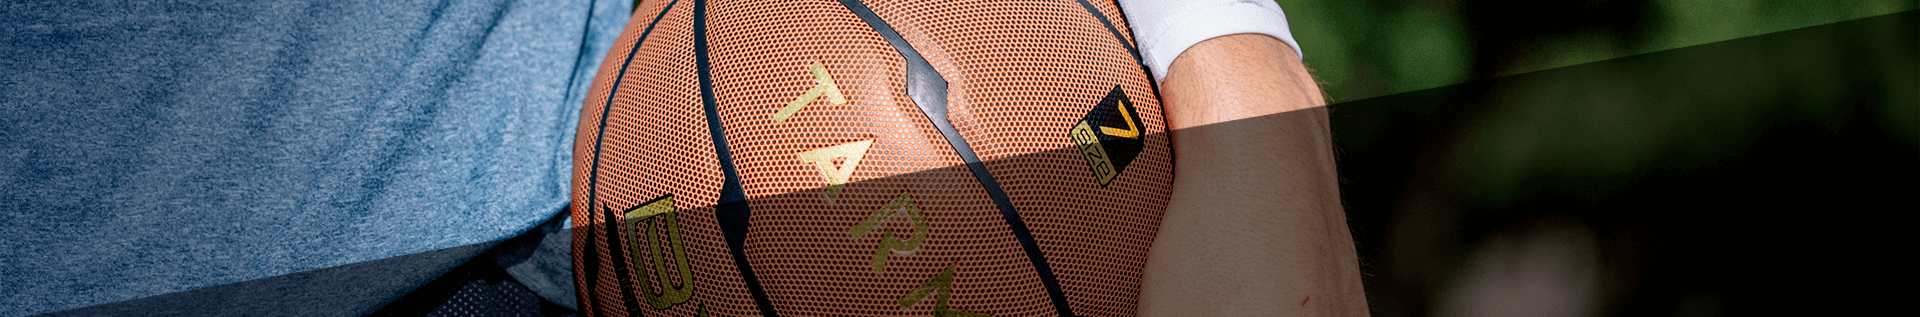 Дитячий баскетбольний одяг